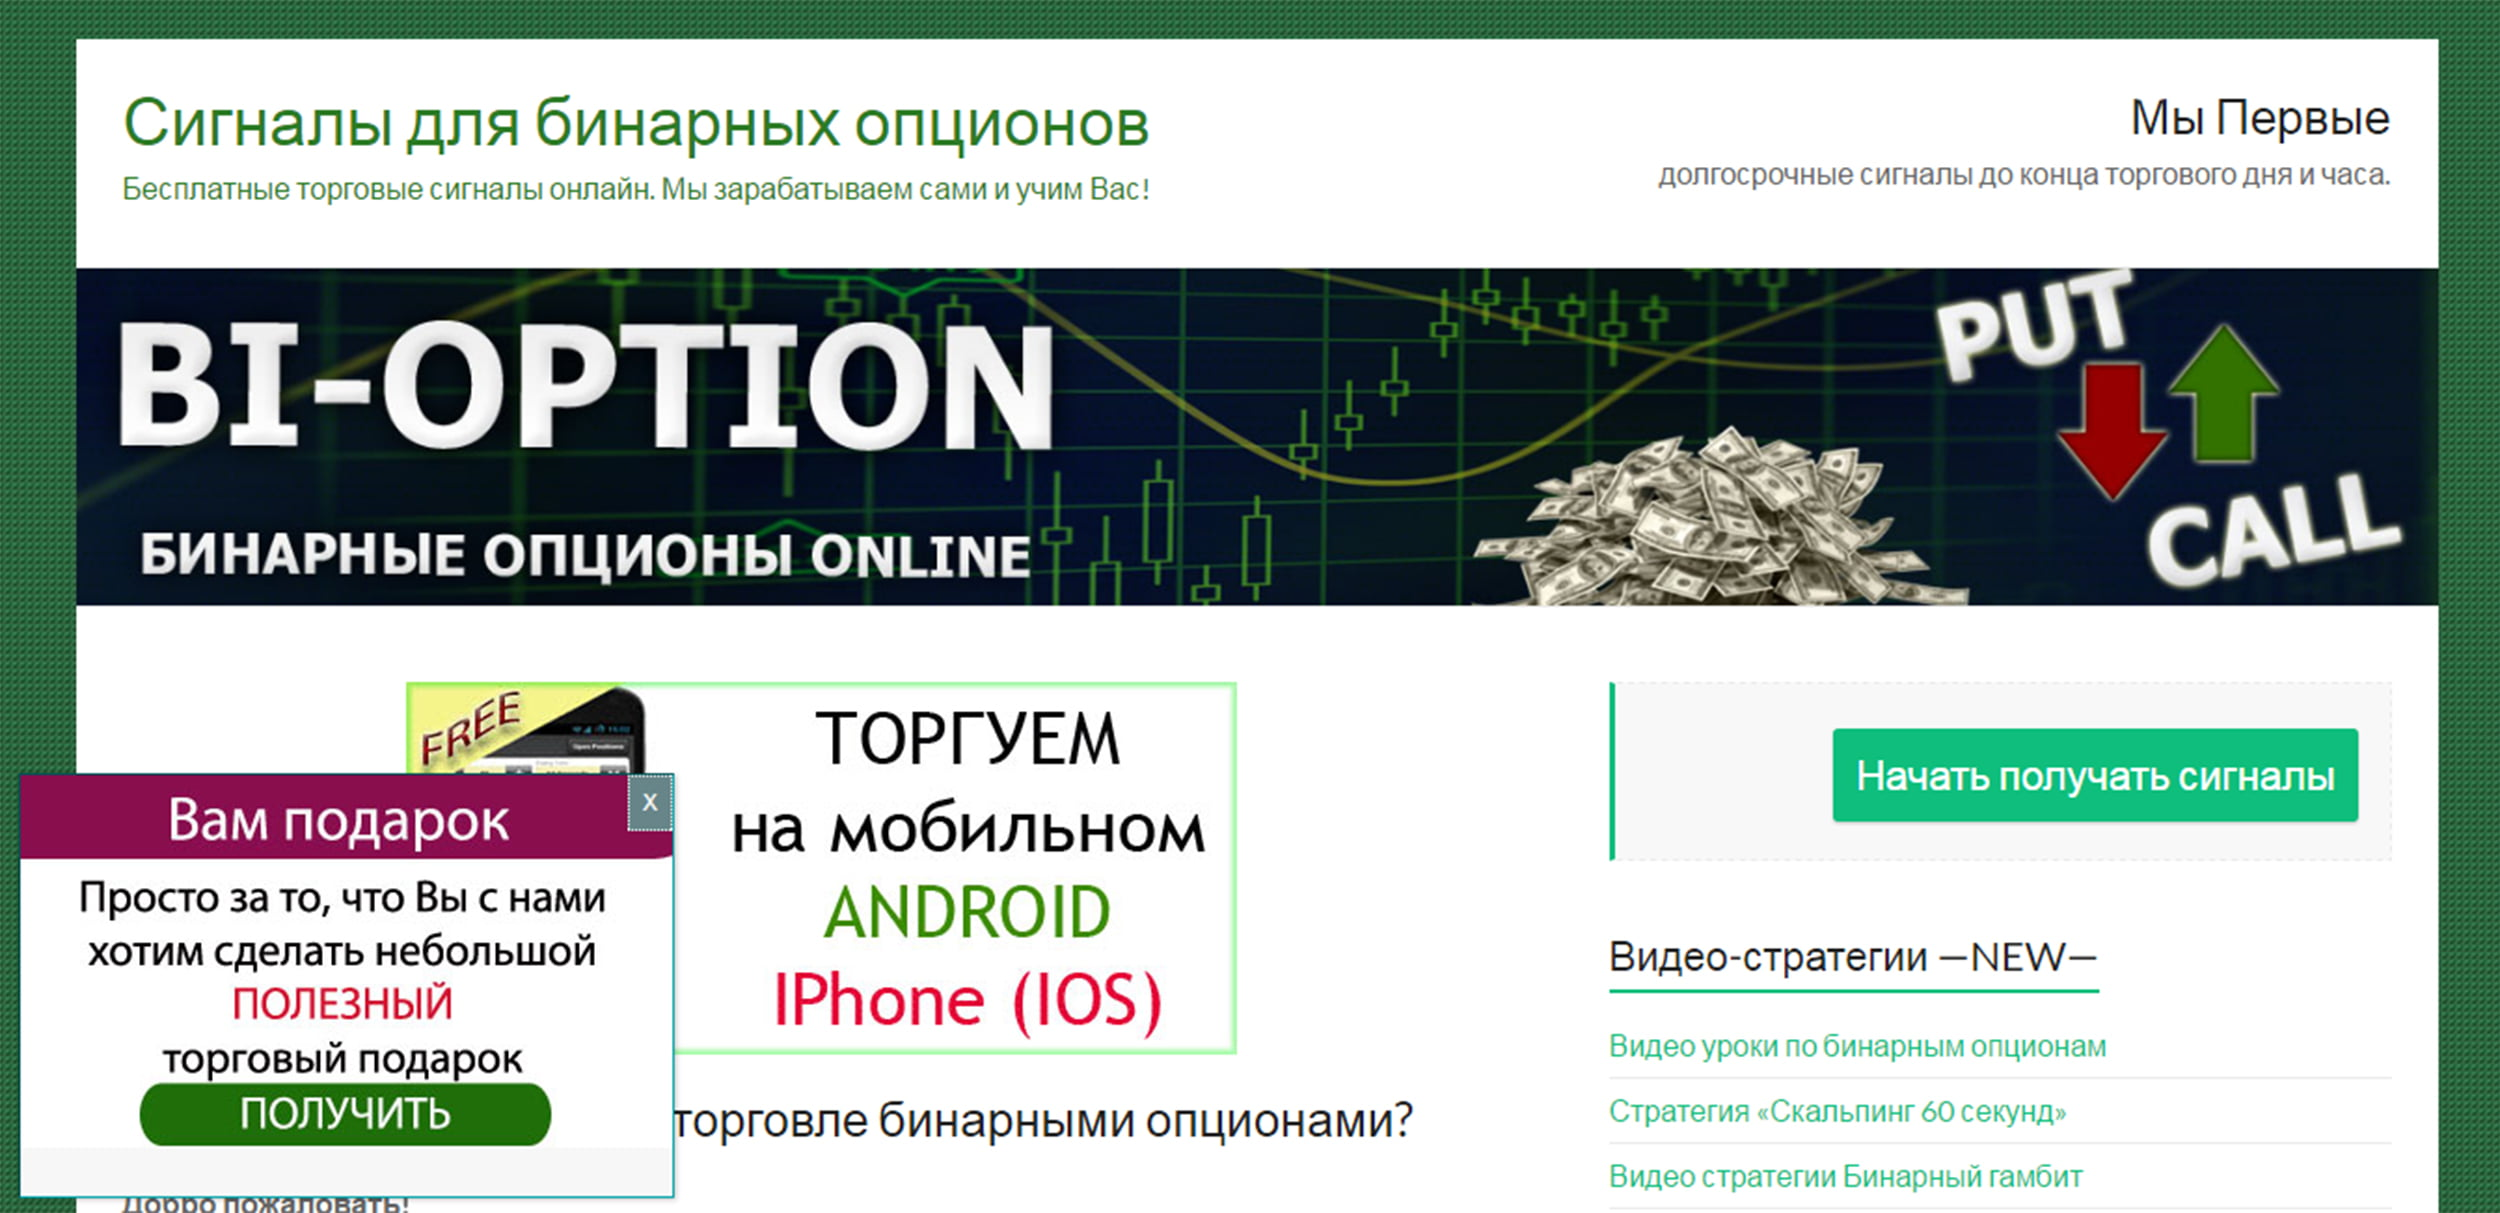 Bi-option.biz